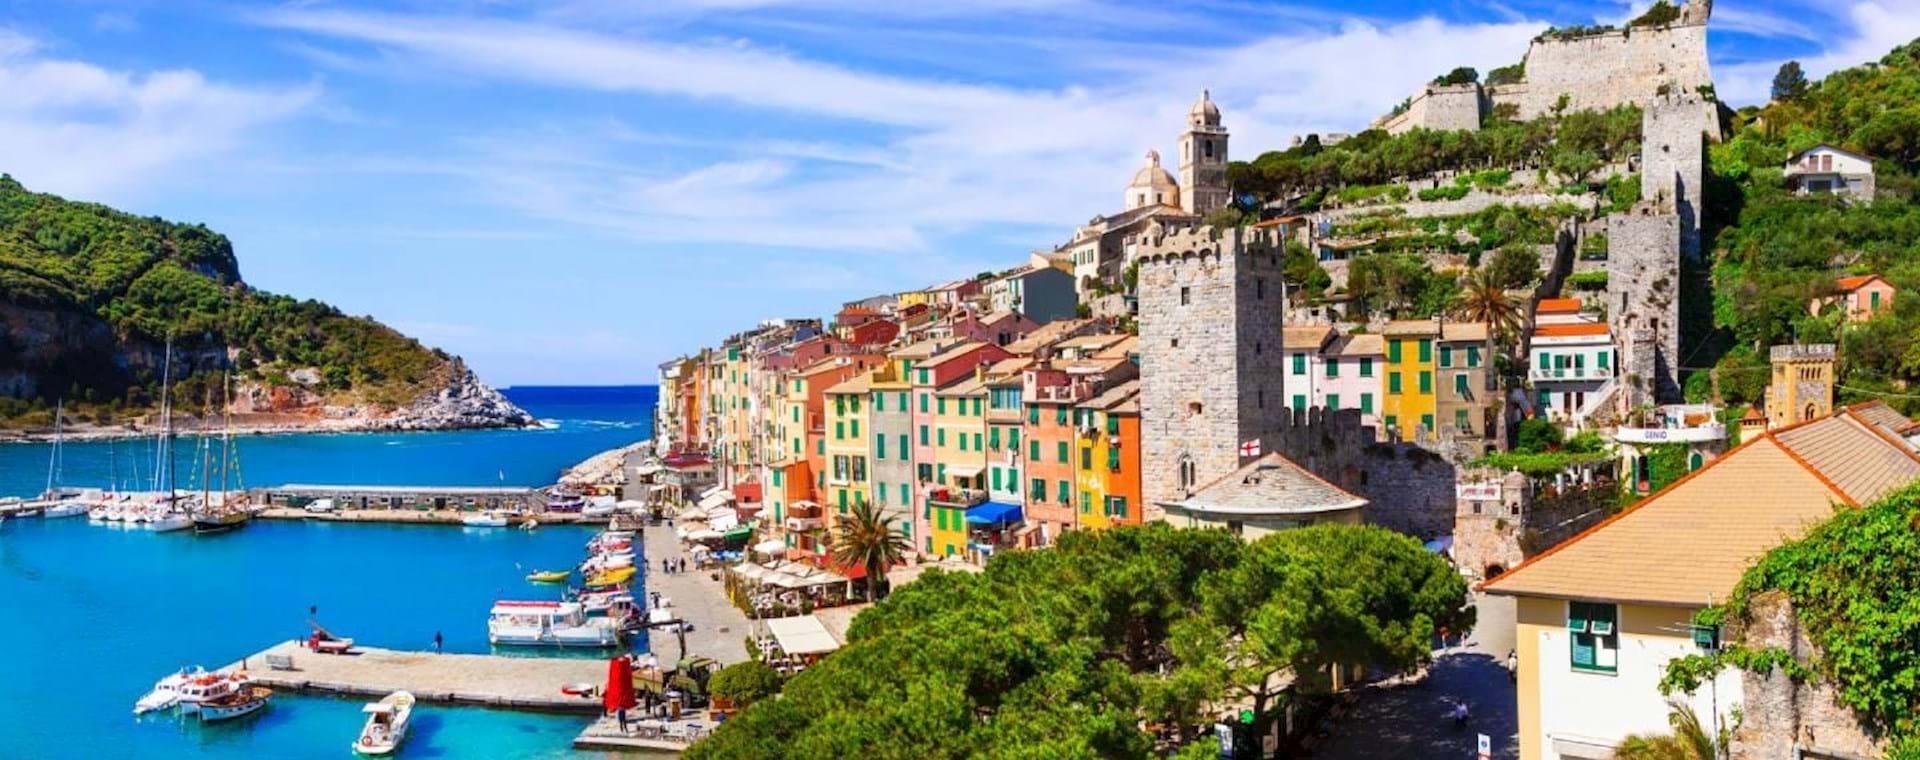 Cinque Terre and Portovenere from Milan